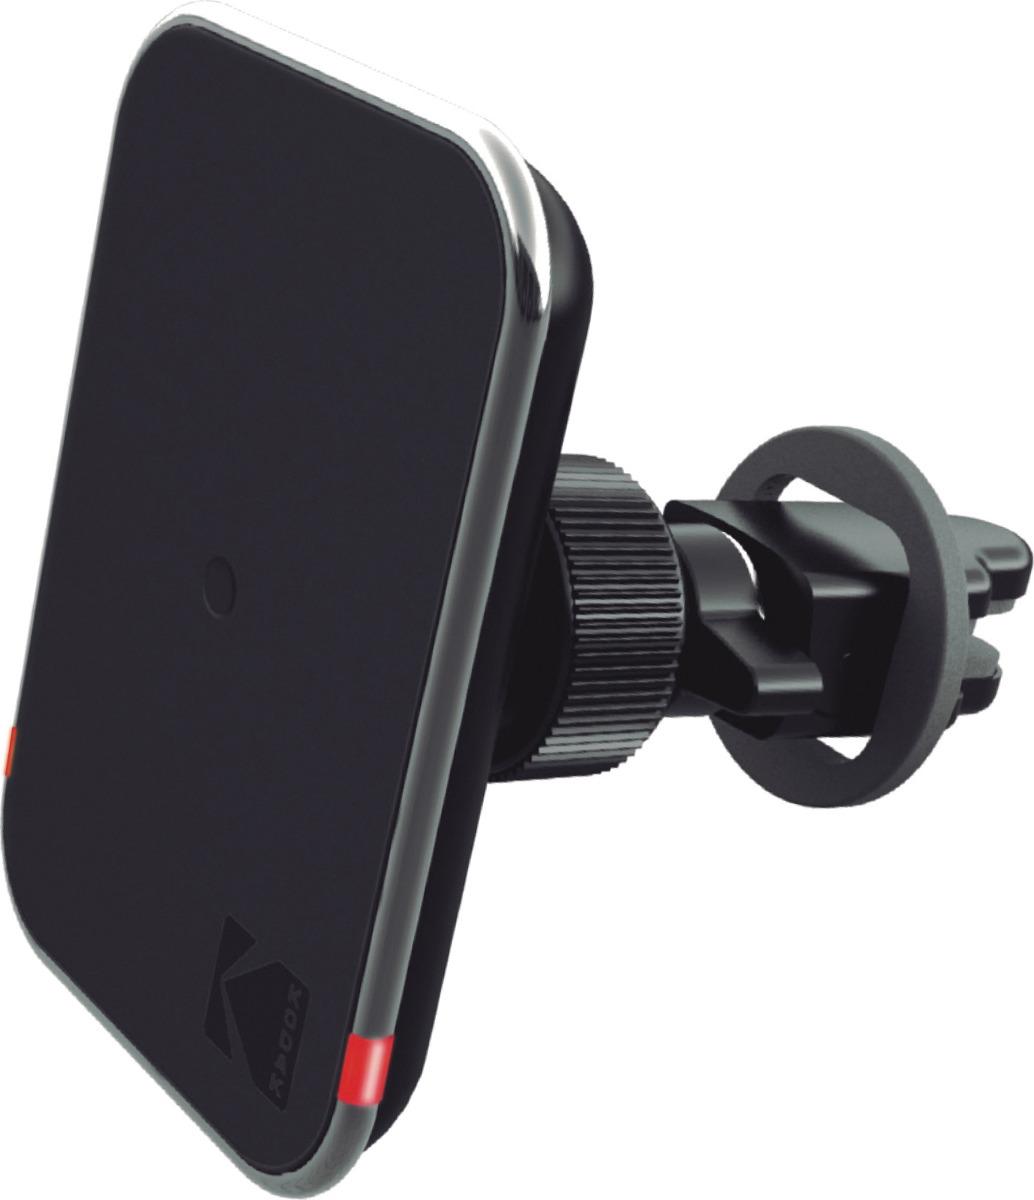 Фото - Автомобильное зарядное устройство Kodak, UC102, черный беспроводное автомобильное зарядное устройство черный